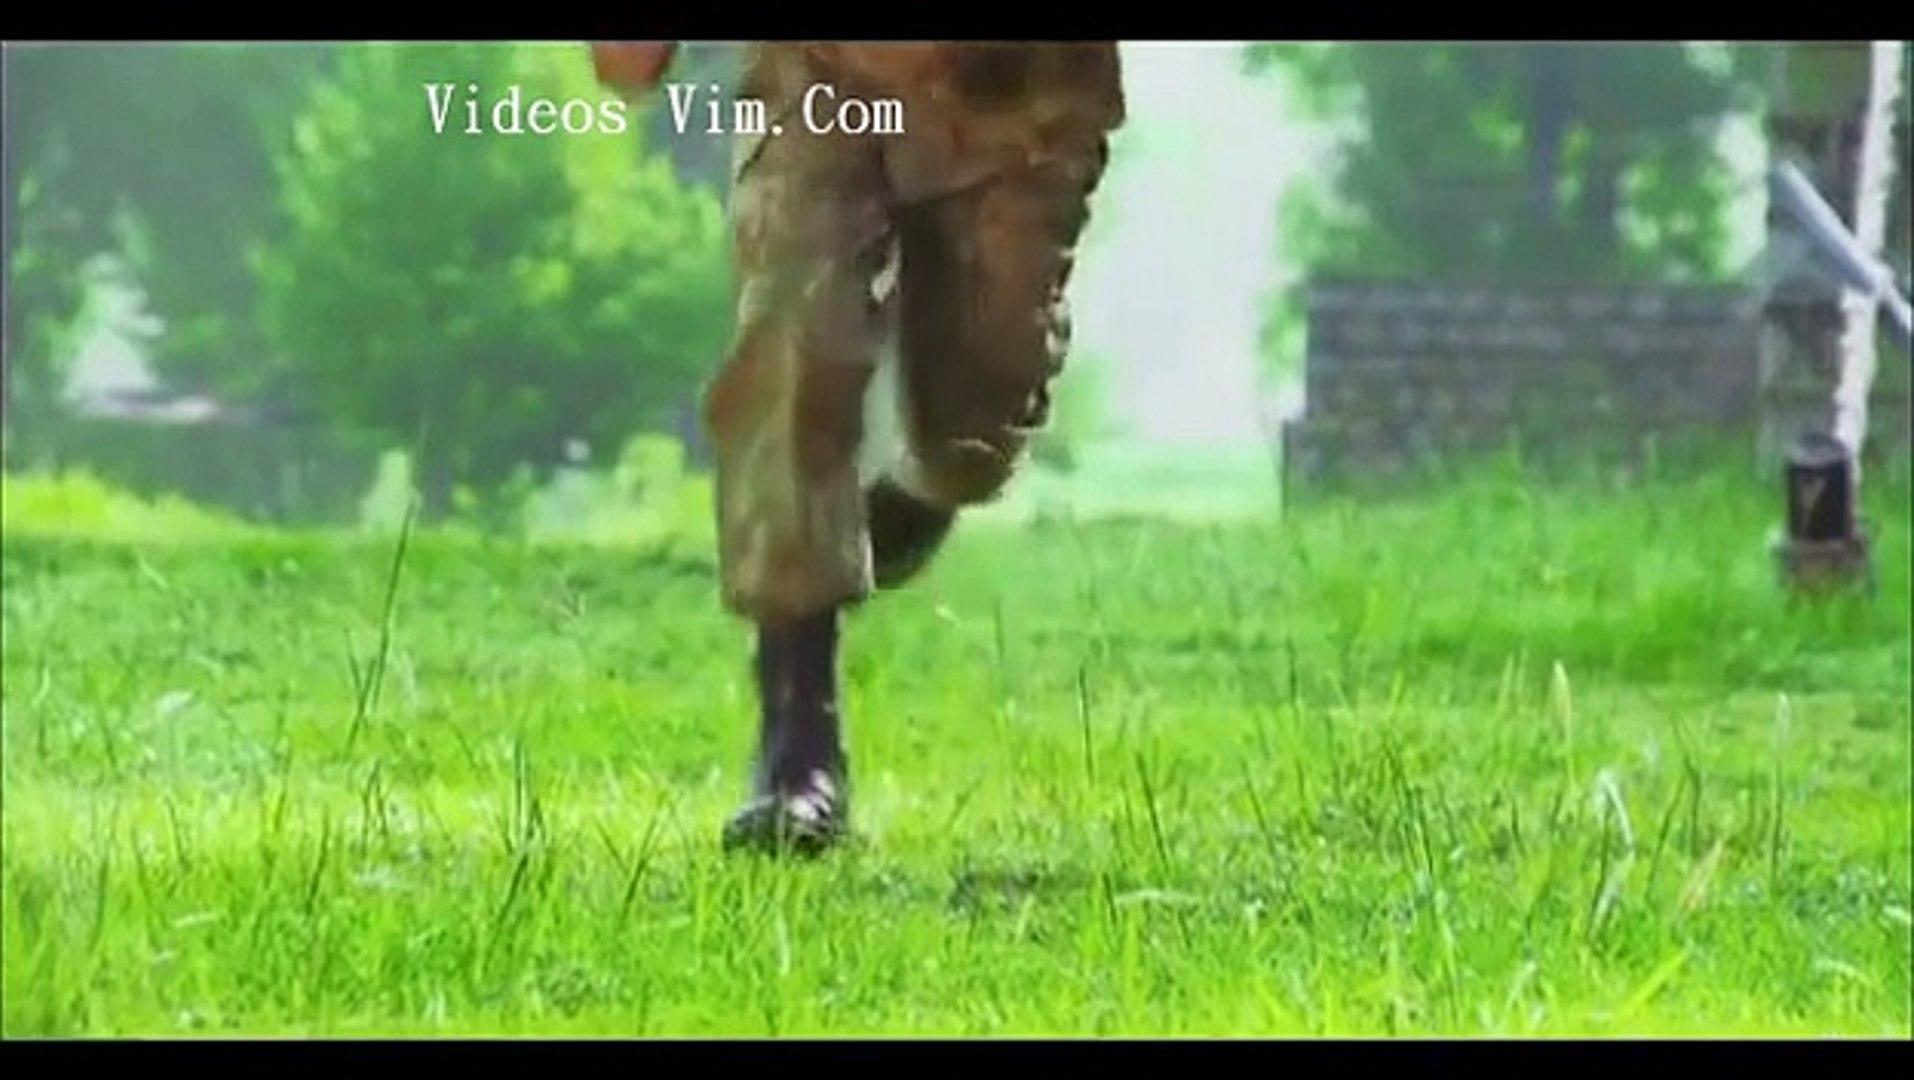 ISPR documentary on Pakistan Armed Forces winner of Rome Film festival best documentary award